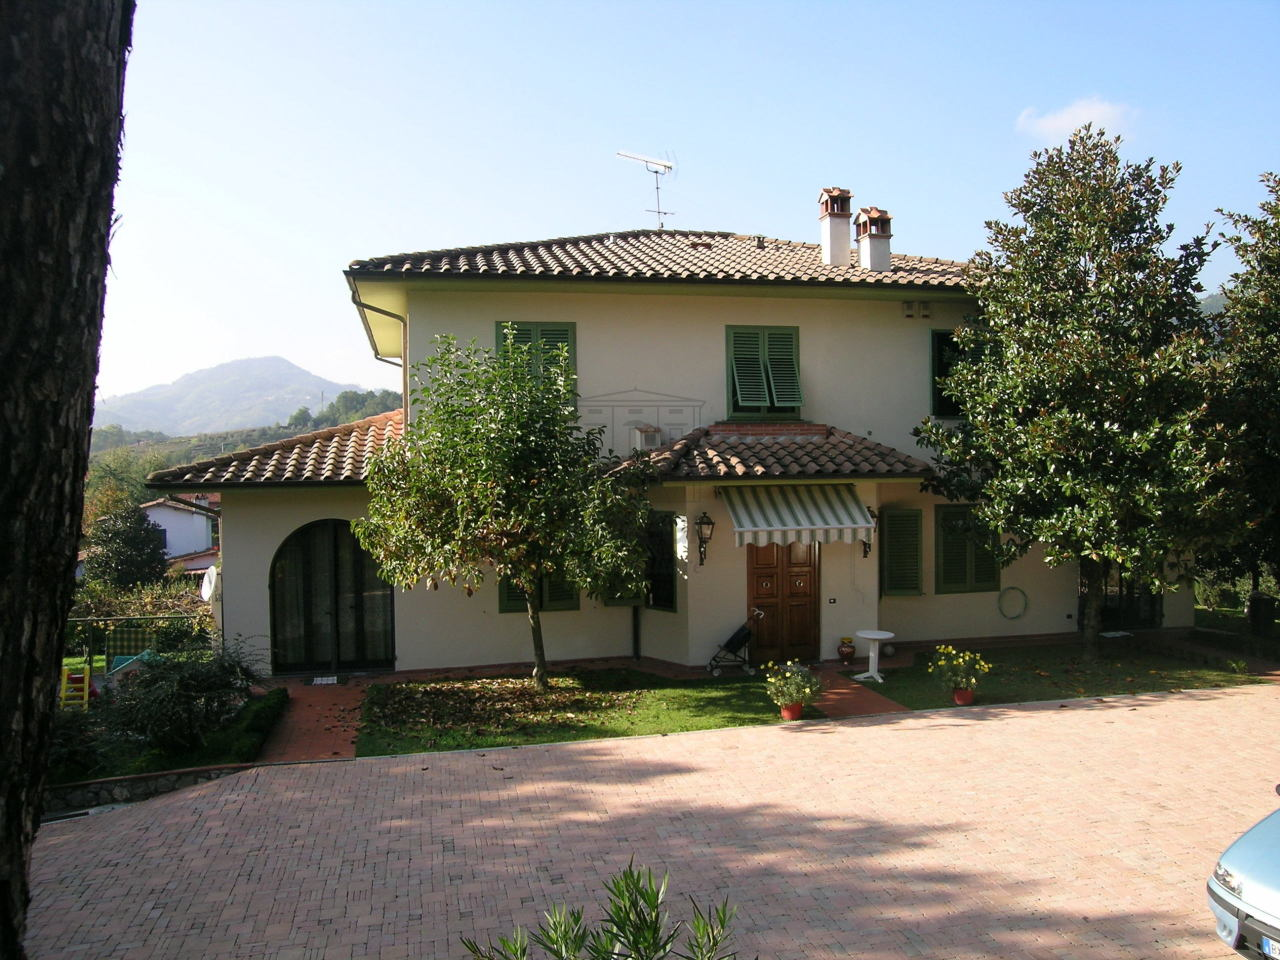 IA00264 Lucca Trecancelli